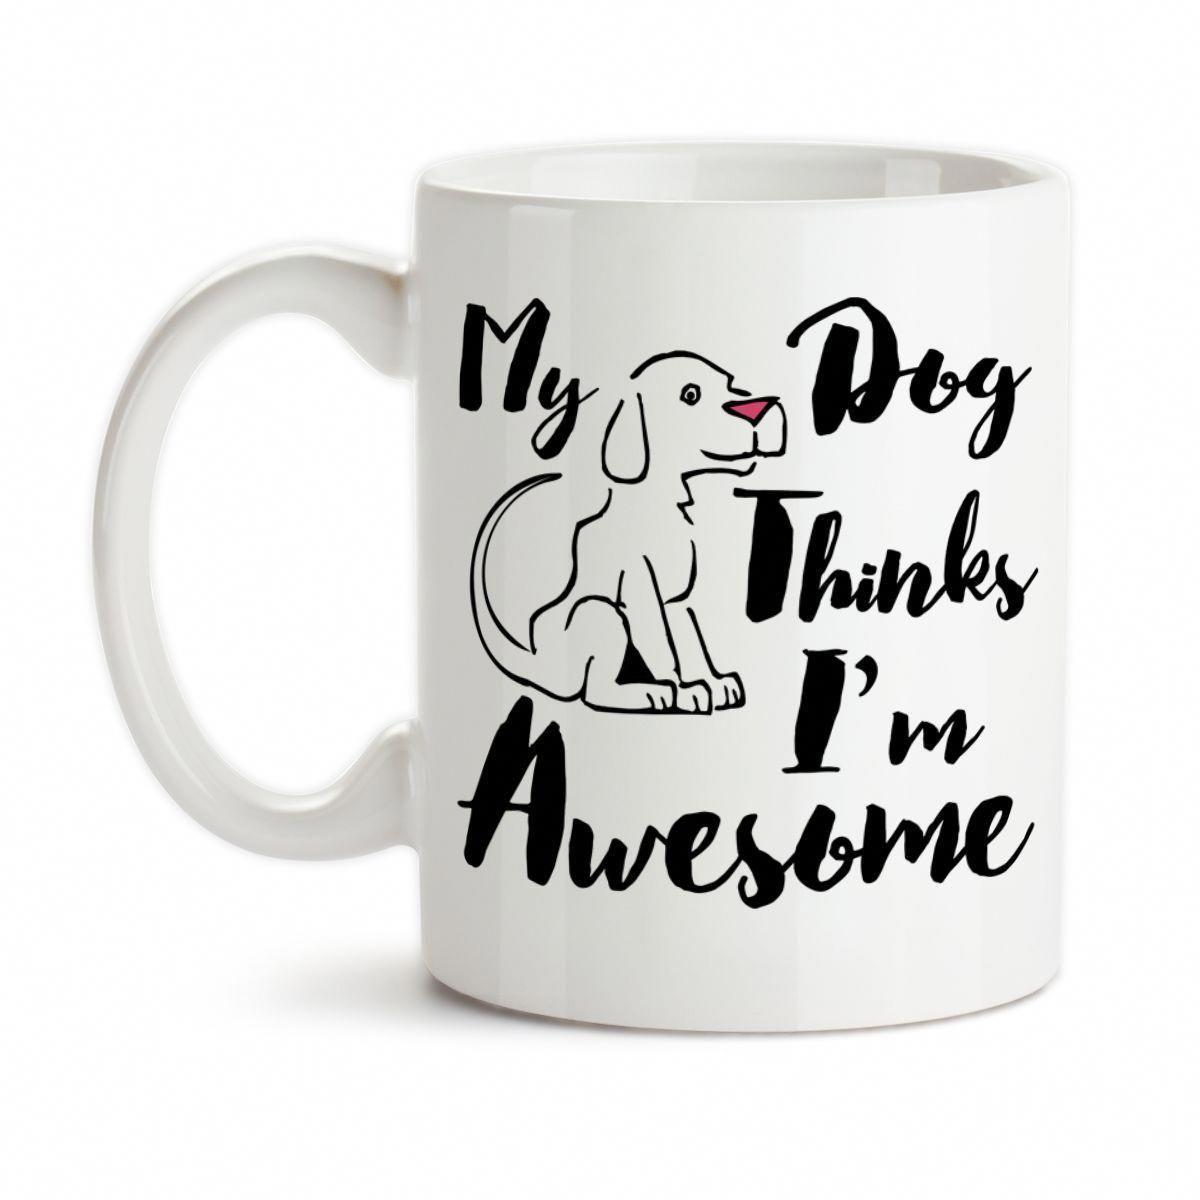 Coffee Mug My Dog Thinks I M Awesome Humor Dogs Puppy Puppies Pets Love My Dog Cute Dog Cute Dogs Mugs Cream Mugs